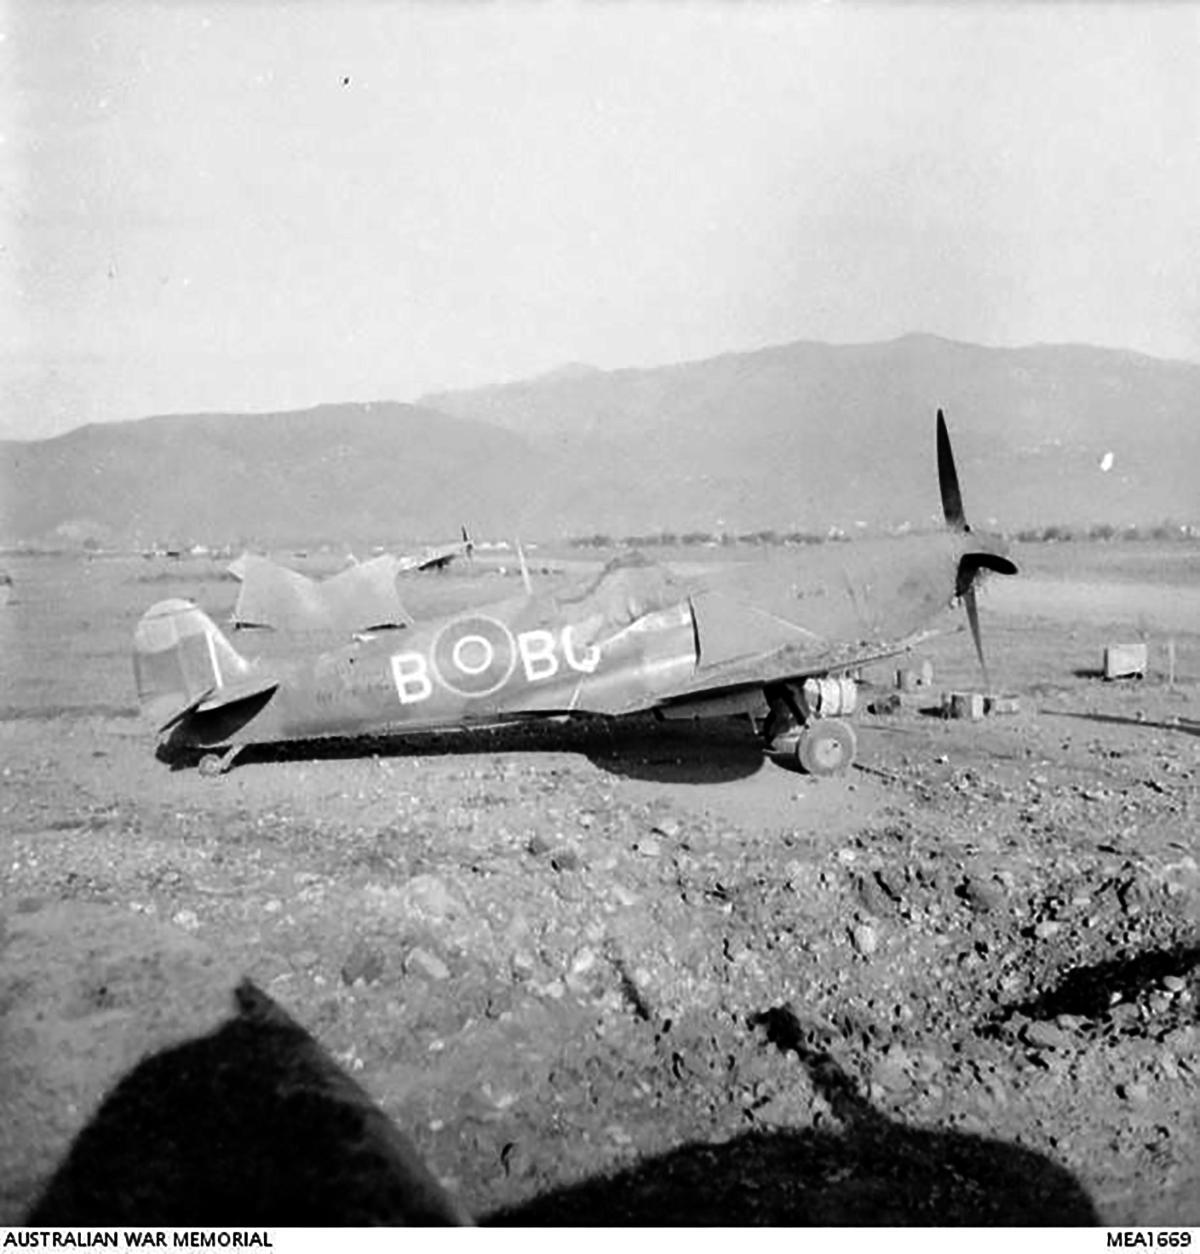 Spitfire IX RAAF 451Sqn BQB Poretta Corsica France 12 May 1944 IWM 01